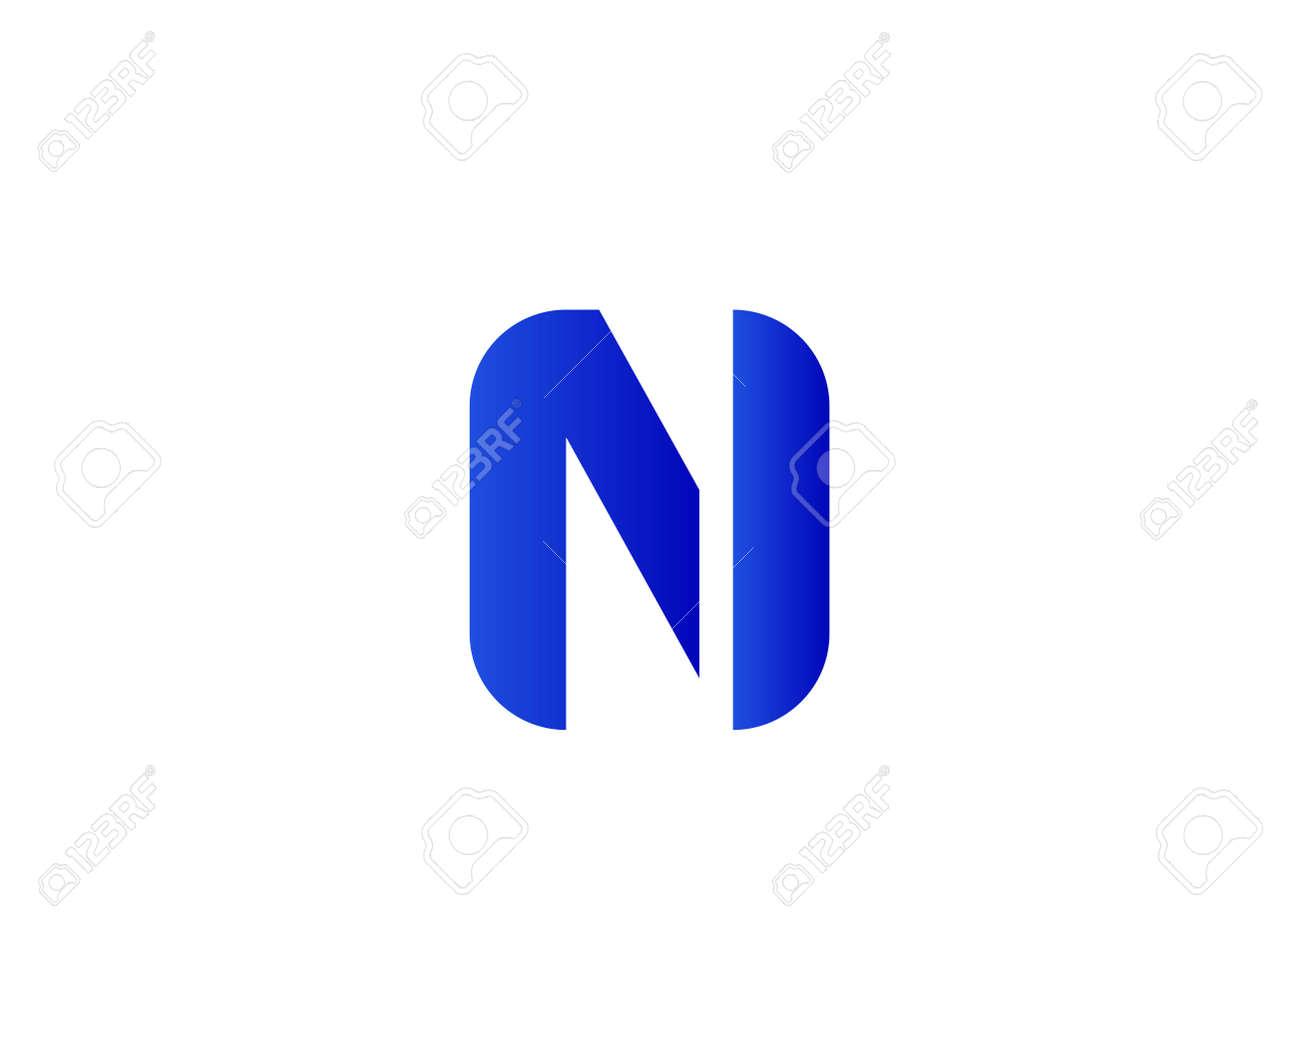 NI IN logo design vector template - 173624509